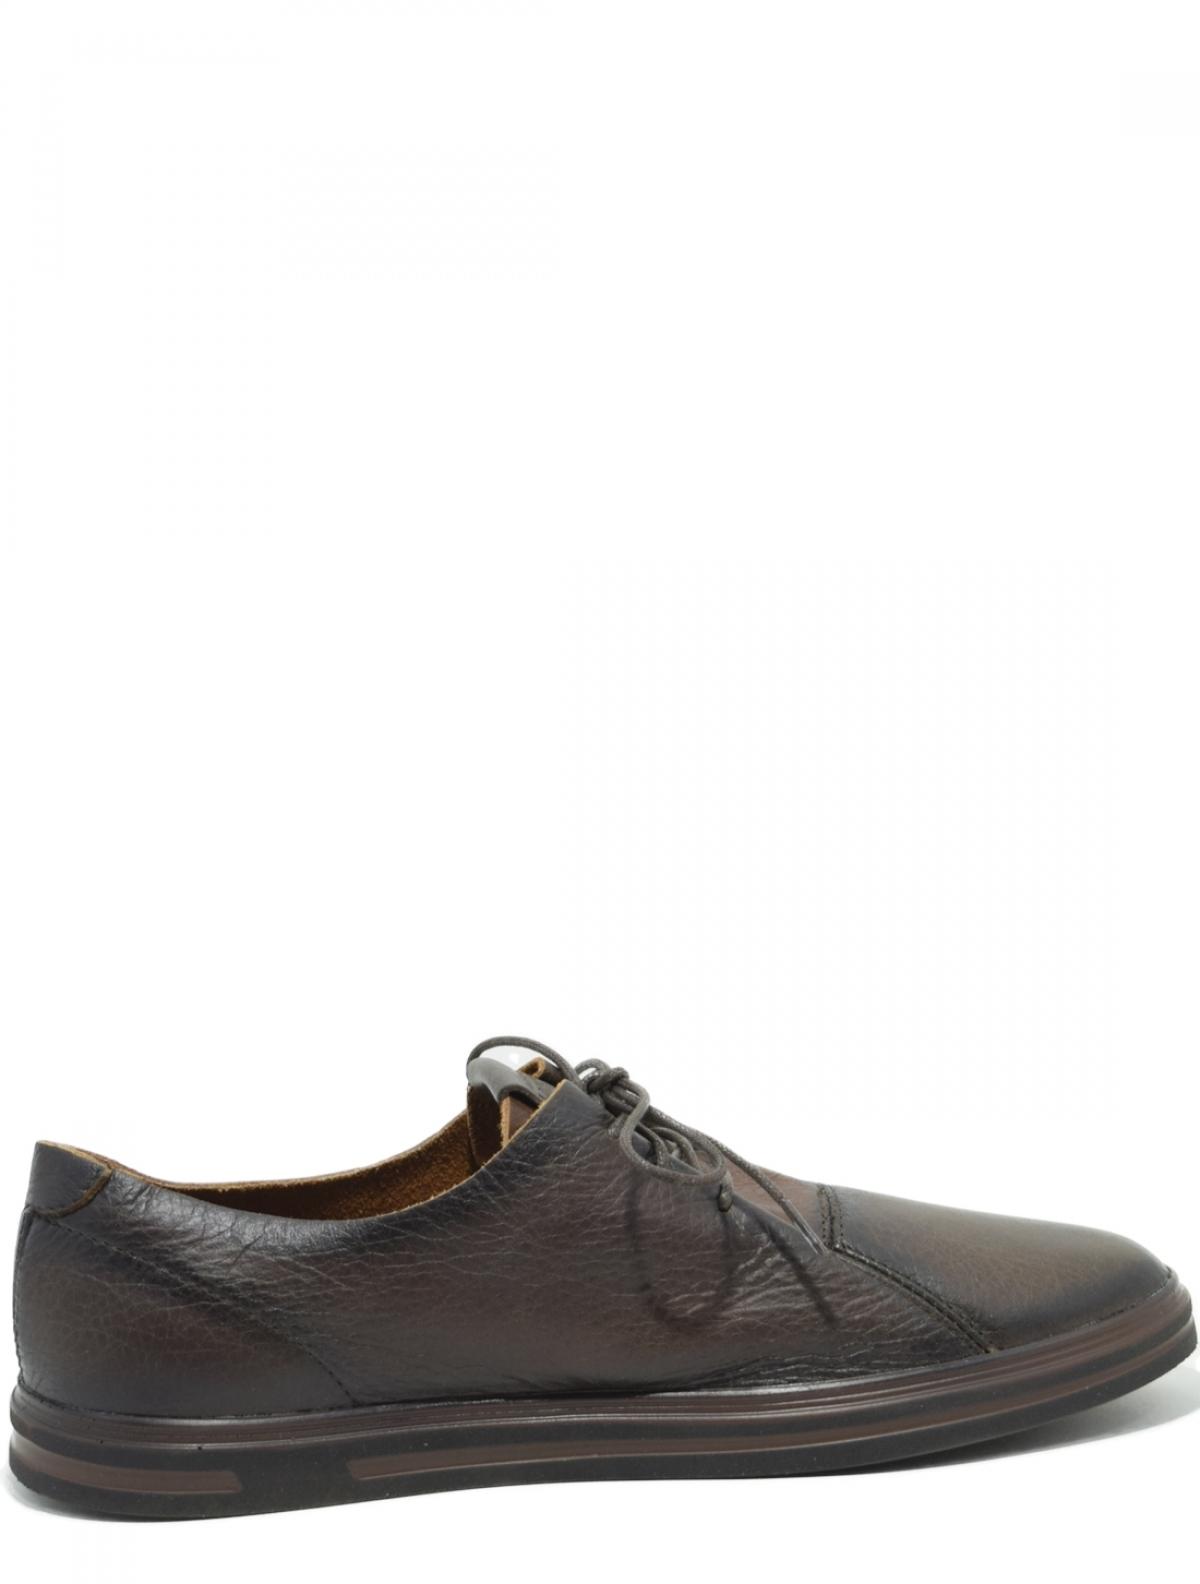 Rooman 500-295-N2C мужские туфли